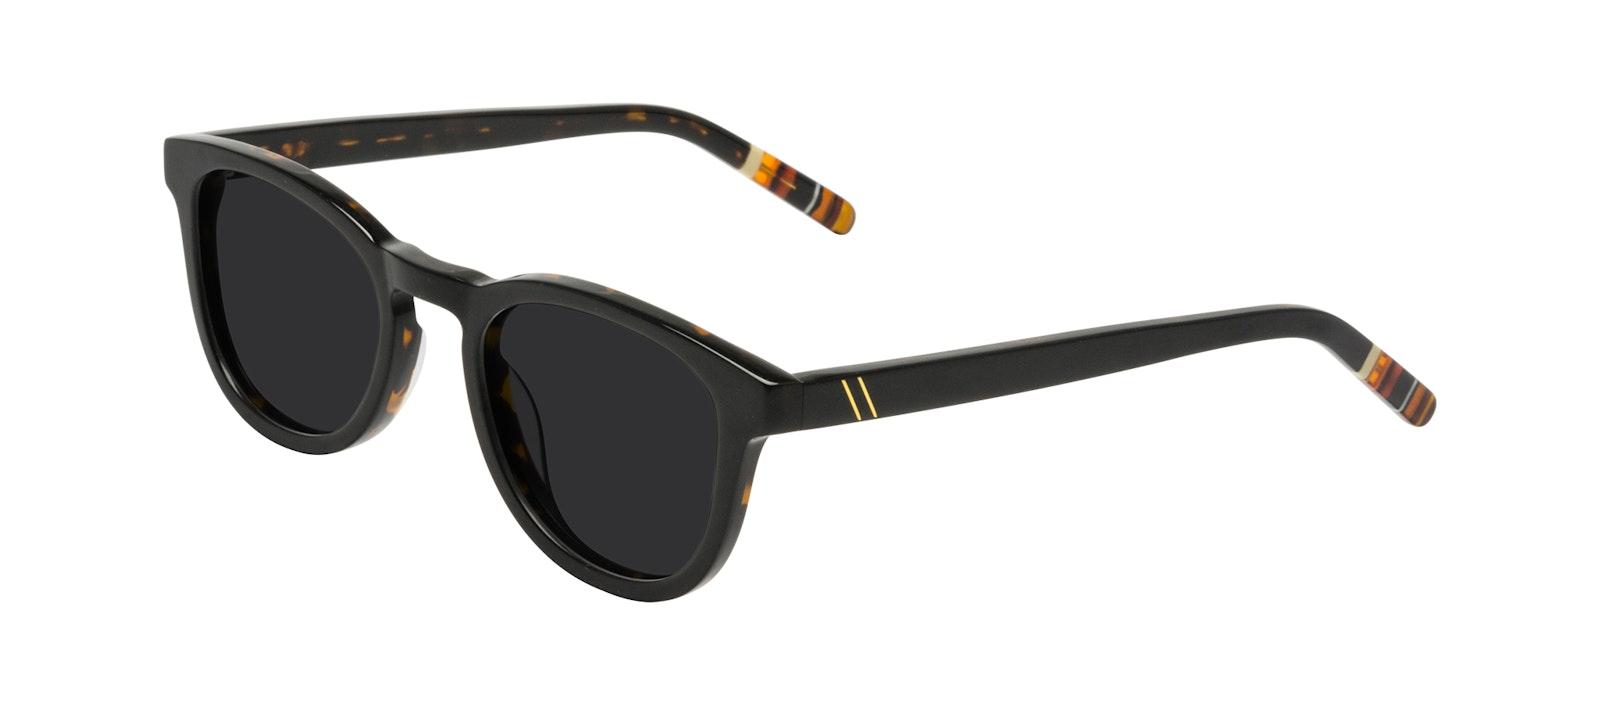 Affordable Fashion Glasses Round Sunglasses Men Goal Black Tort Tilt